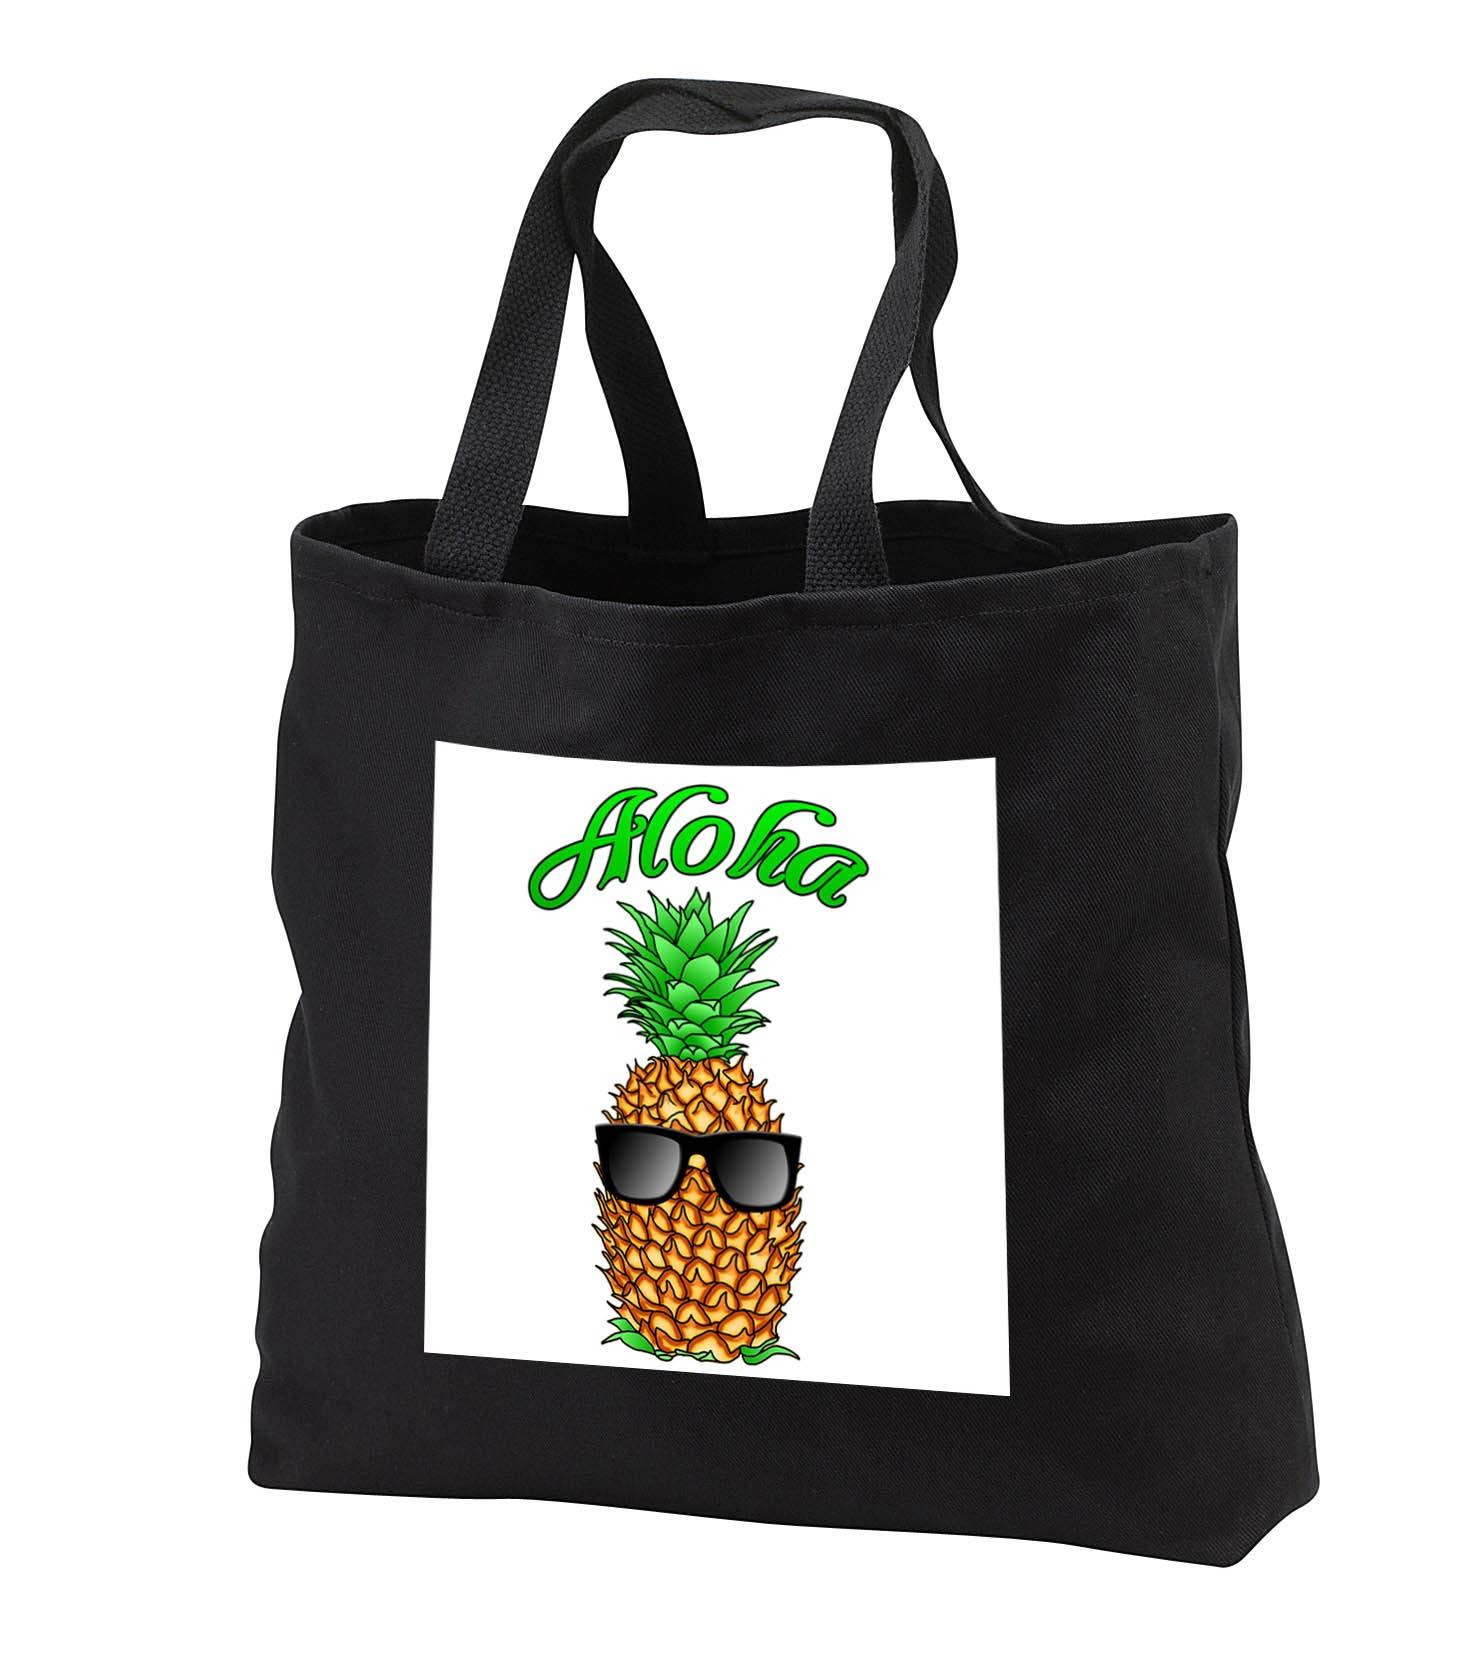 MacDonald Creative Studios - Hawaii - Aloha Hawaiian design with a fun tropical pineapple in sunglasses. - Tote Bags - Black Tote Bag 14w x 14h x 3d (tb_291833_1)